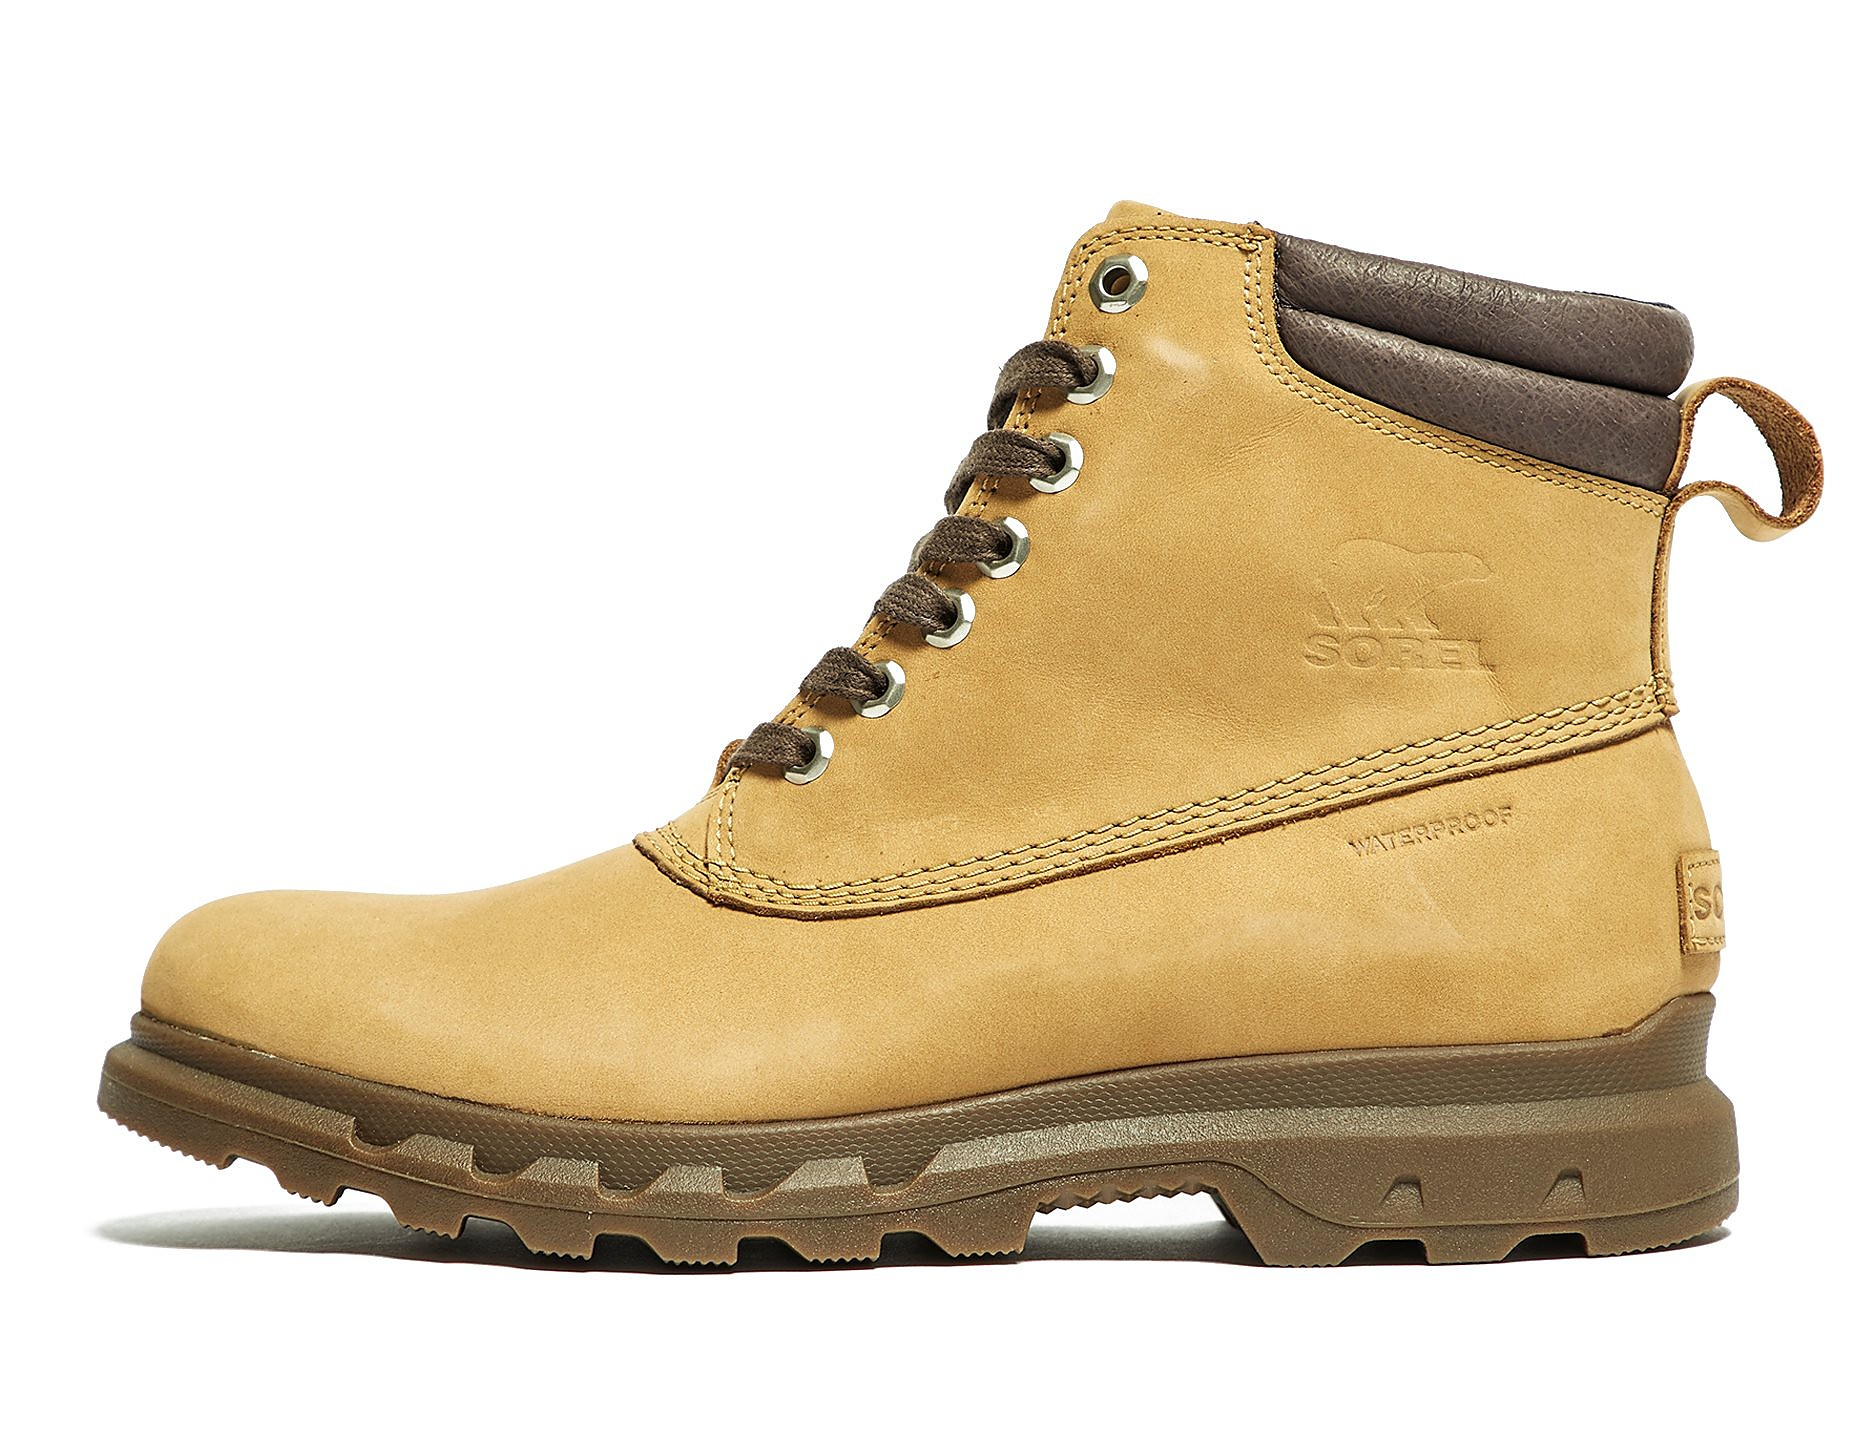 Sorel Portzman Lace Men's Boots